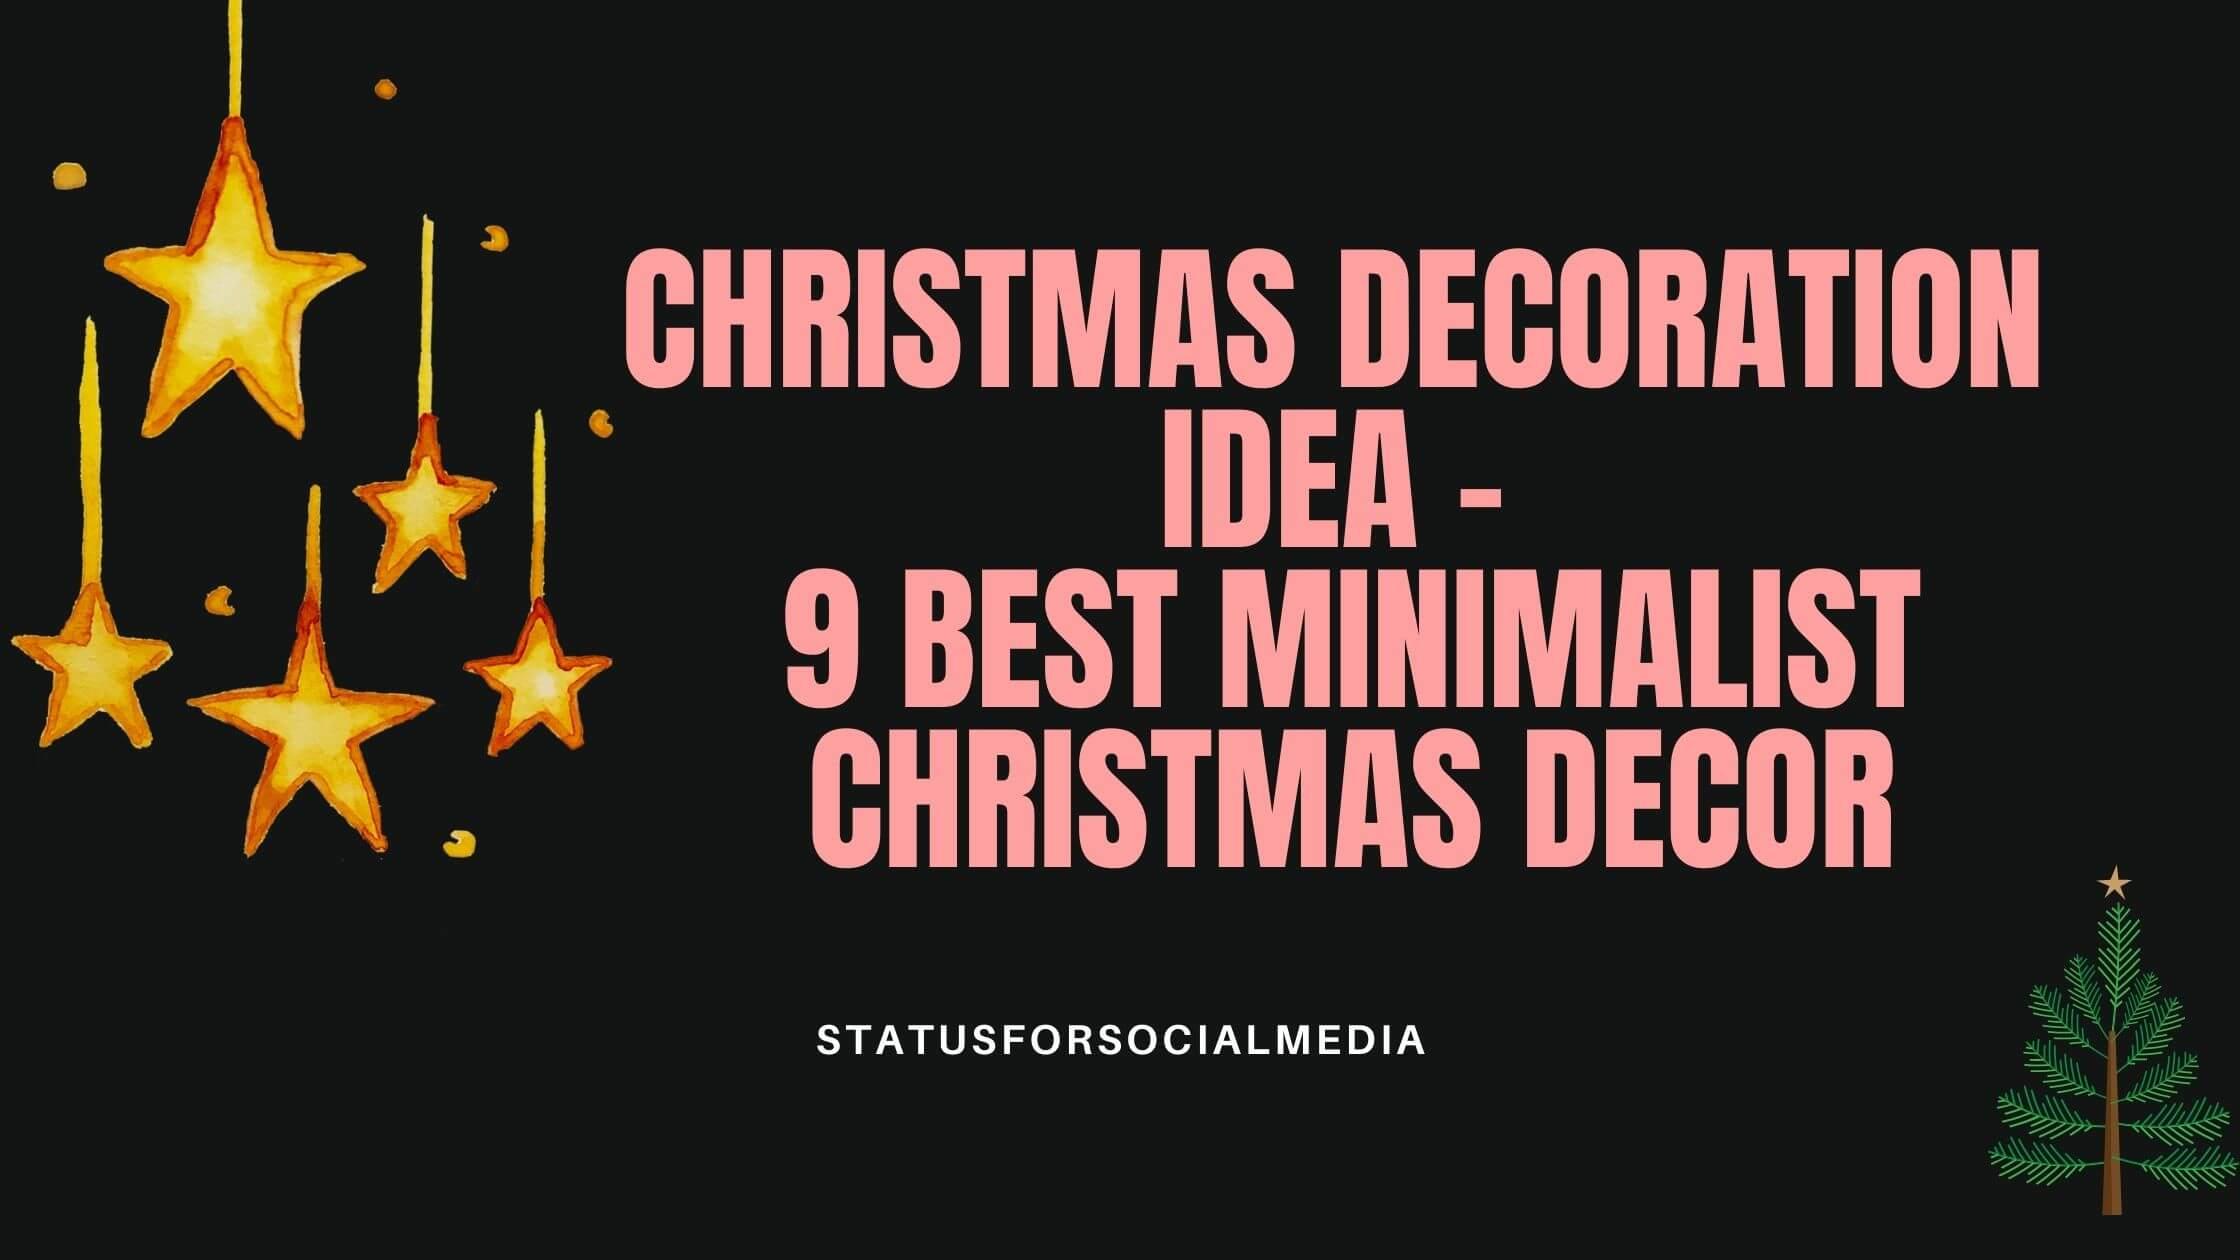 Christmas Decoration Idea STATUSFORSOCIALMEDIA